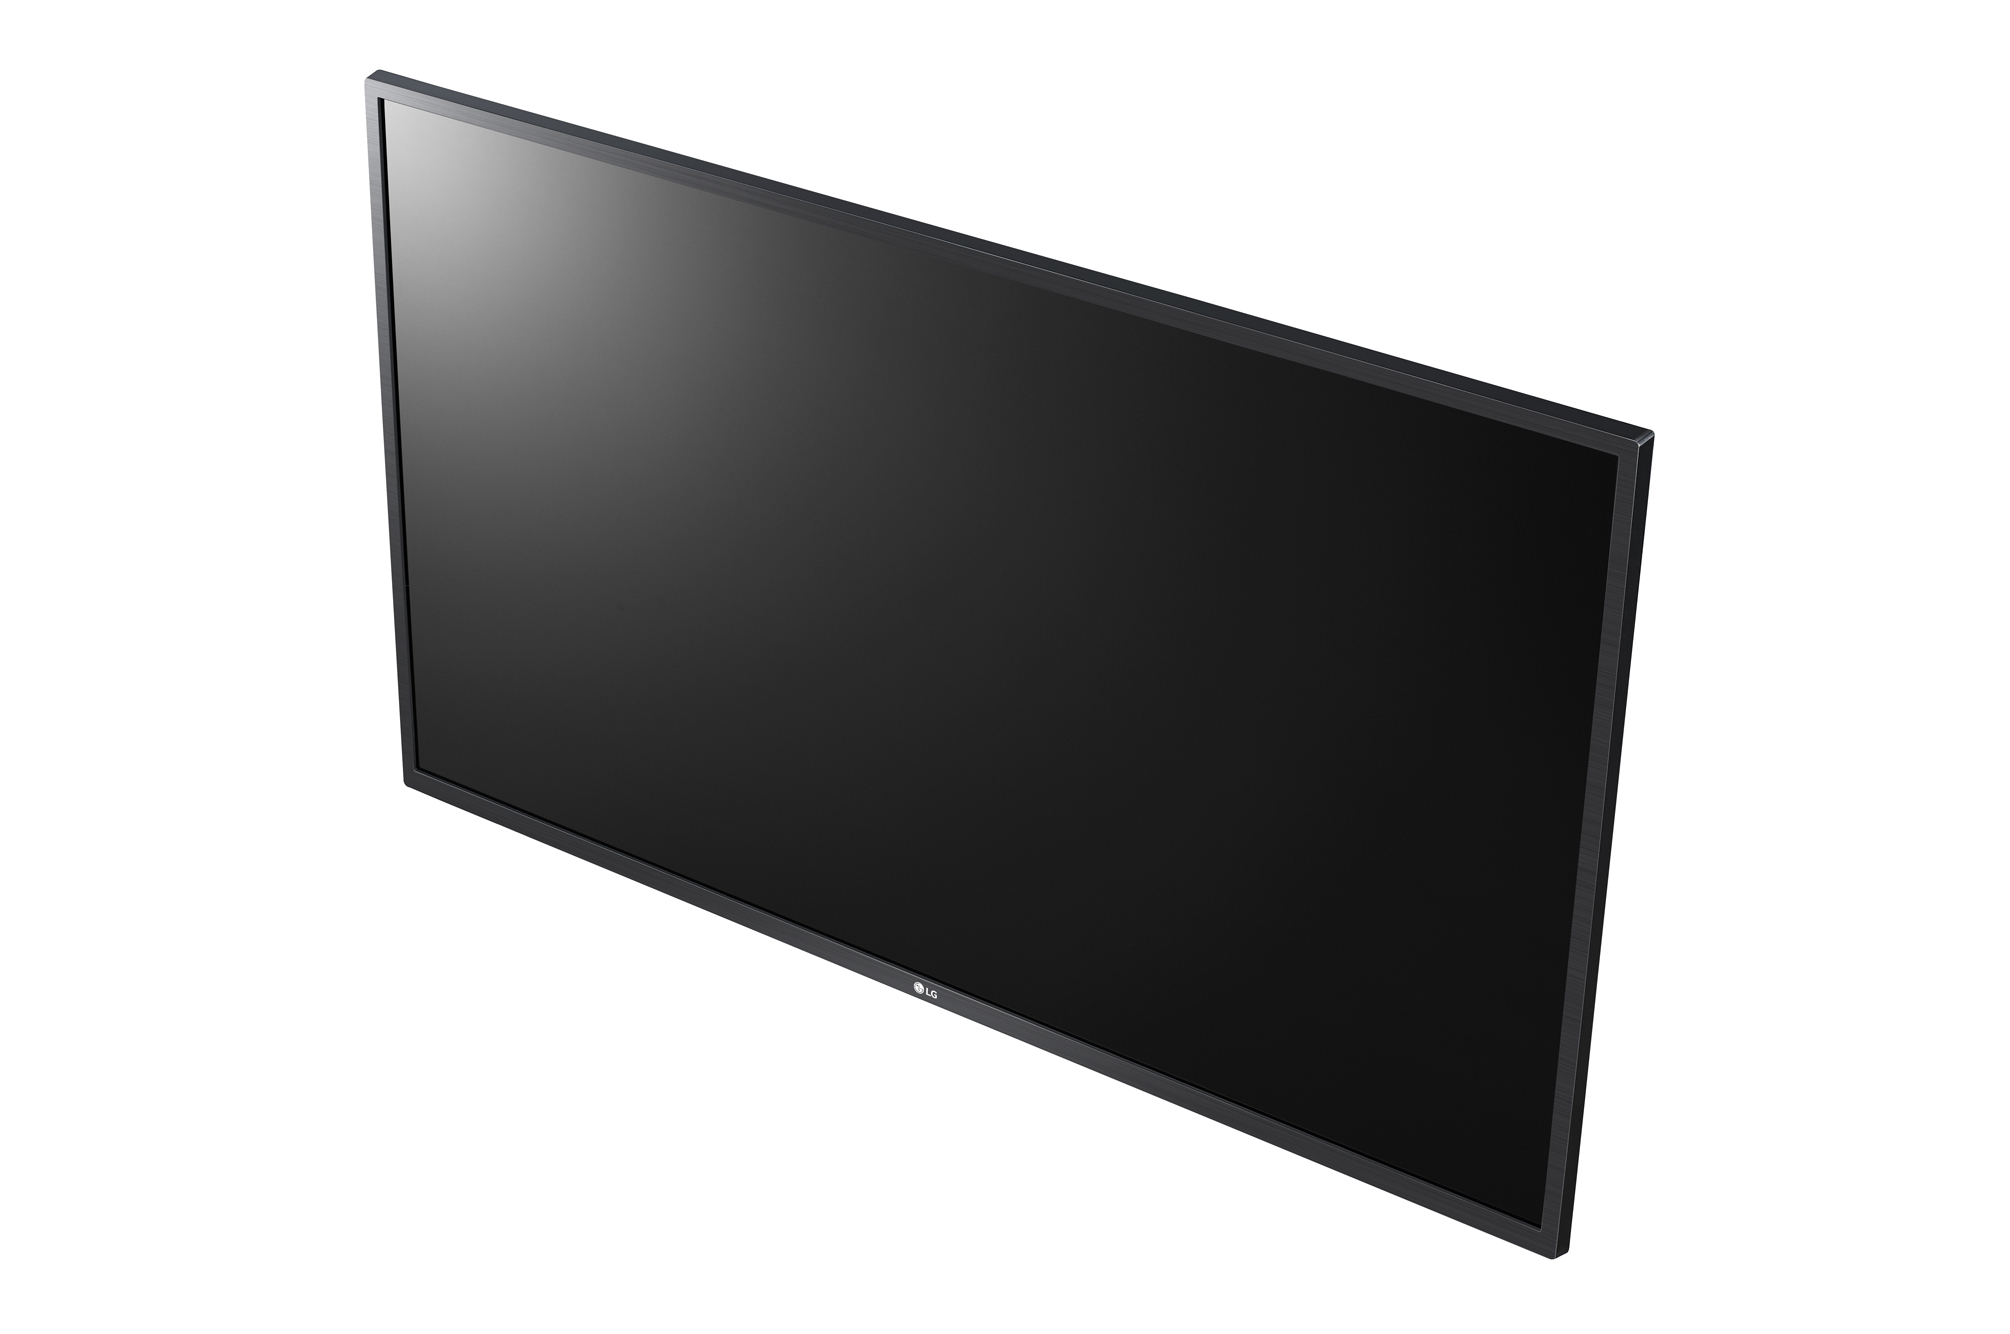 LG Smart TV Signage 43UT640S (CIS) 9